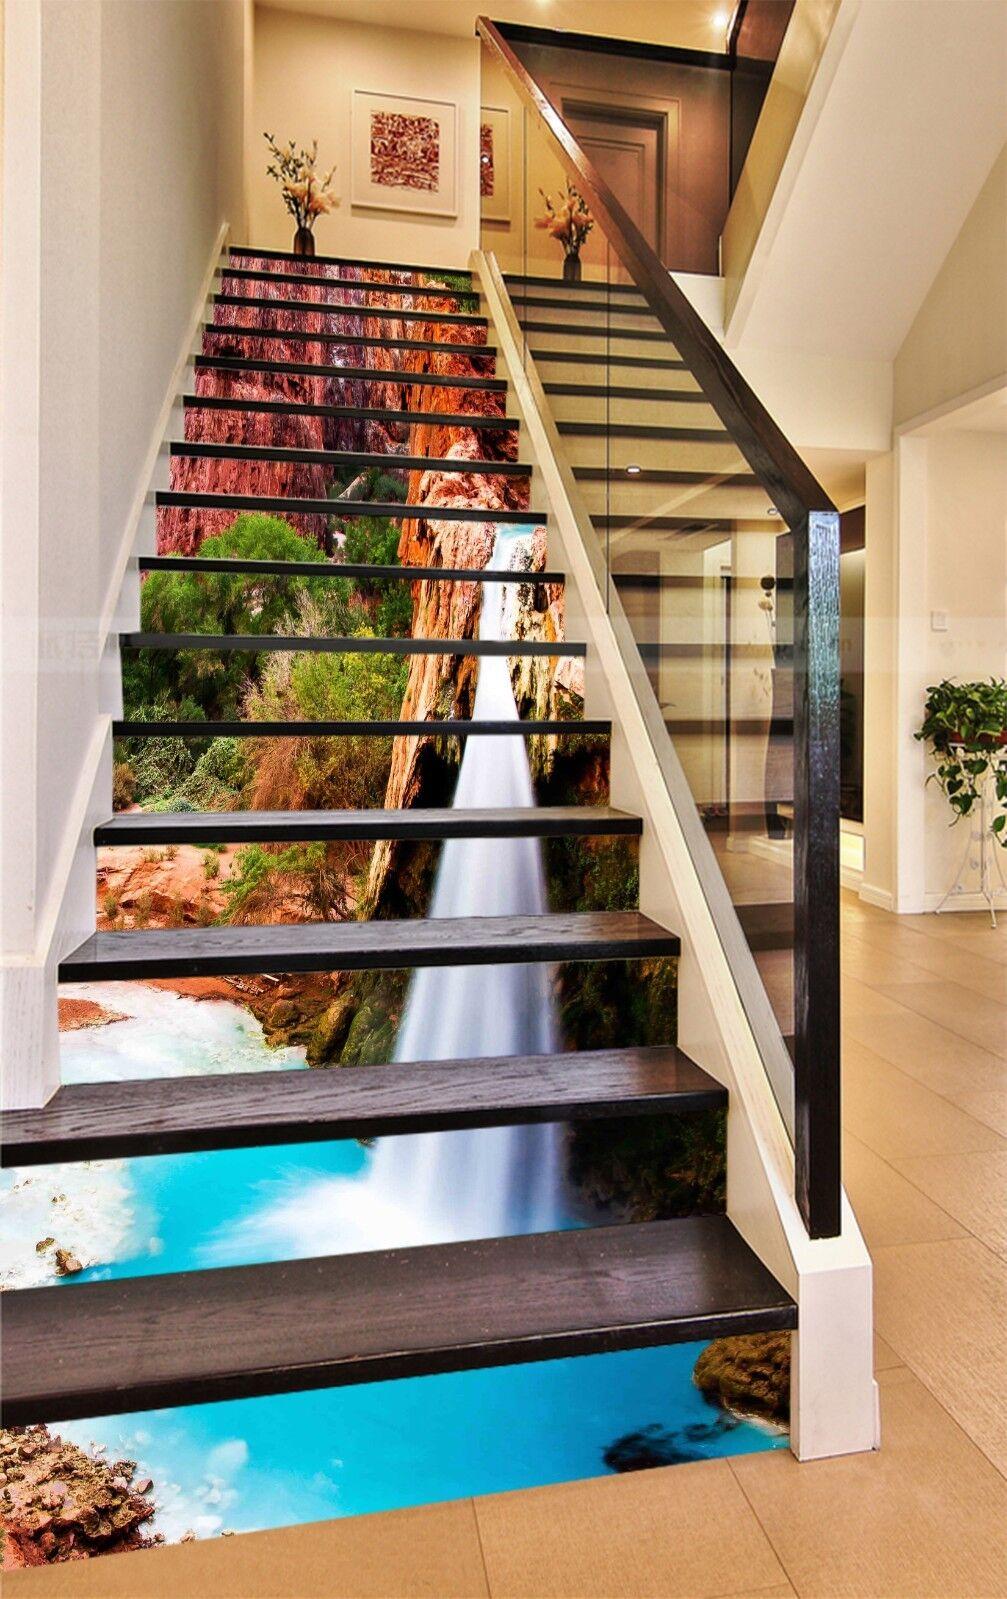 3D Mountain fall 67 Stair Risers Decoration Photo Mural Vinyl Decal Wallpaper UK